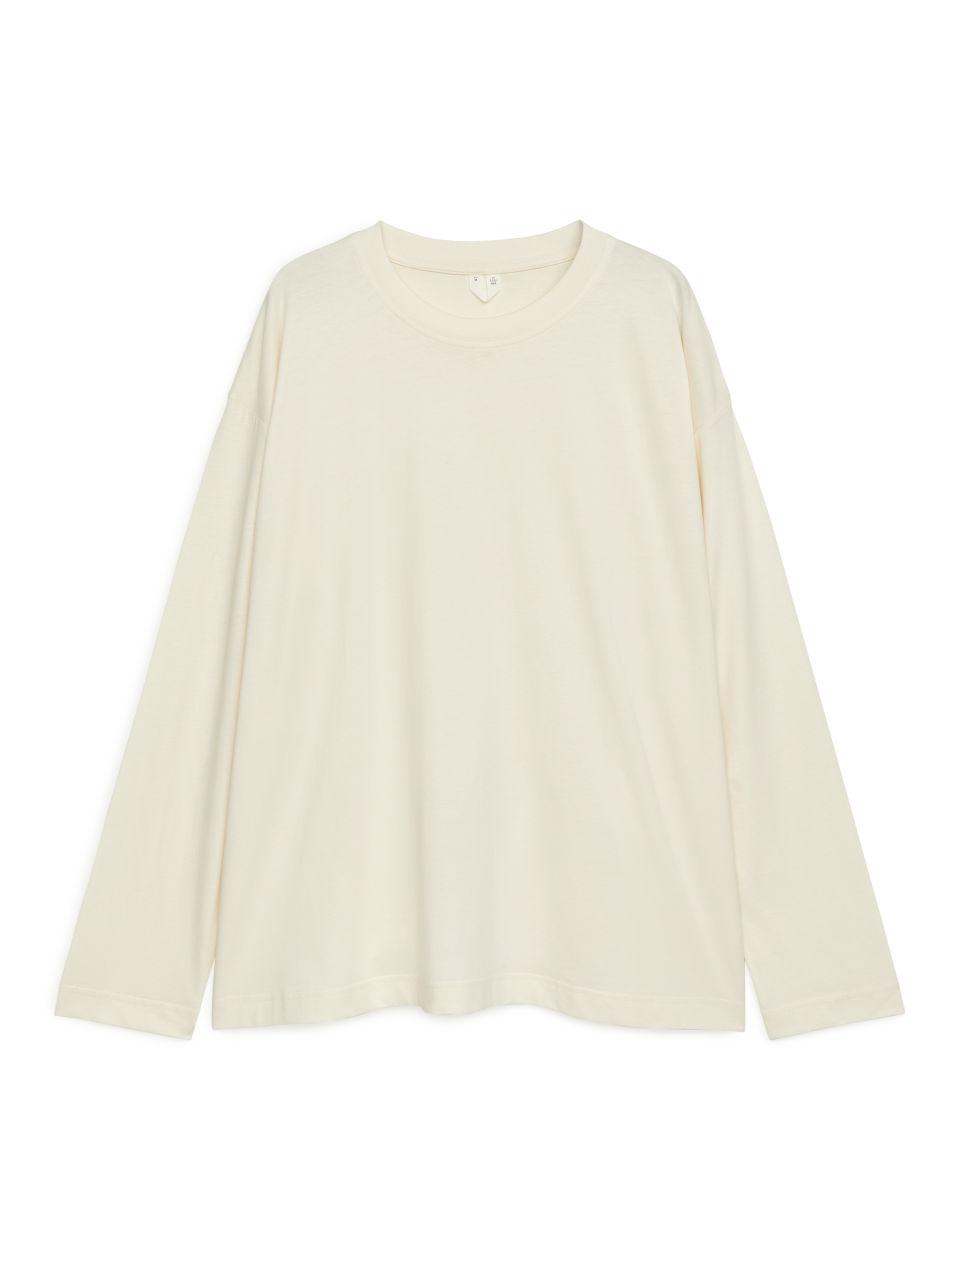 Oversized Pima Cotton T-shirt - White